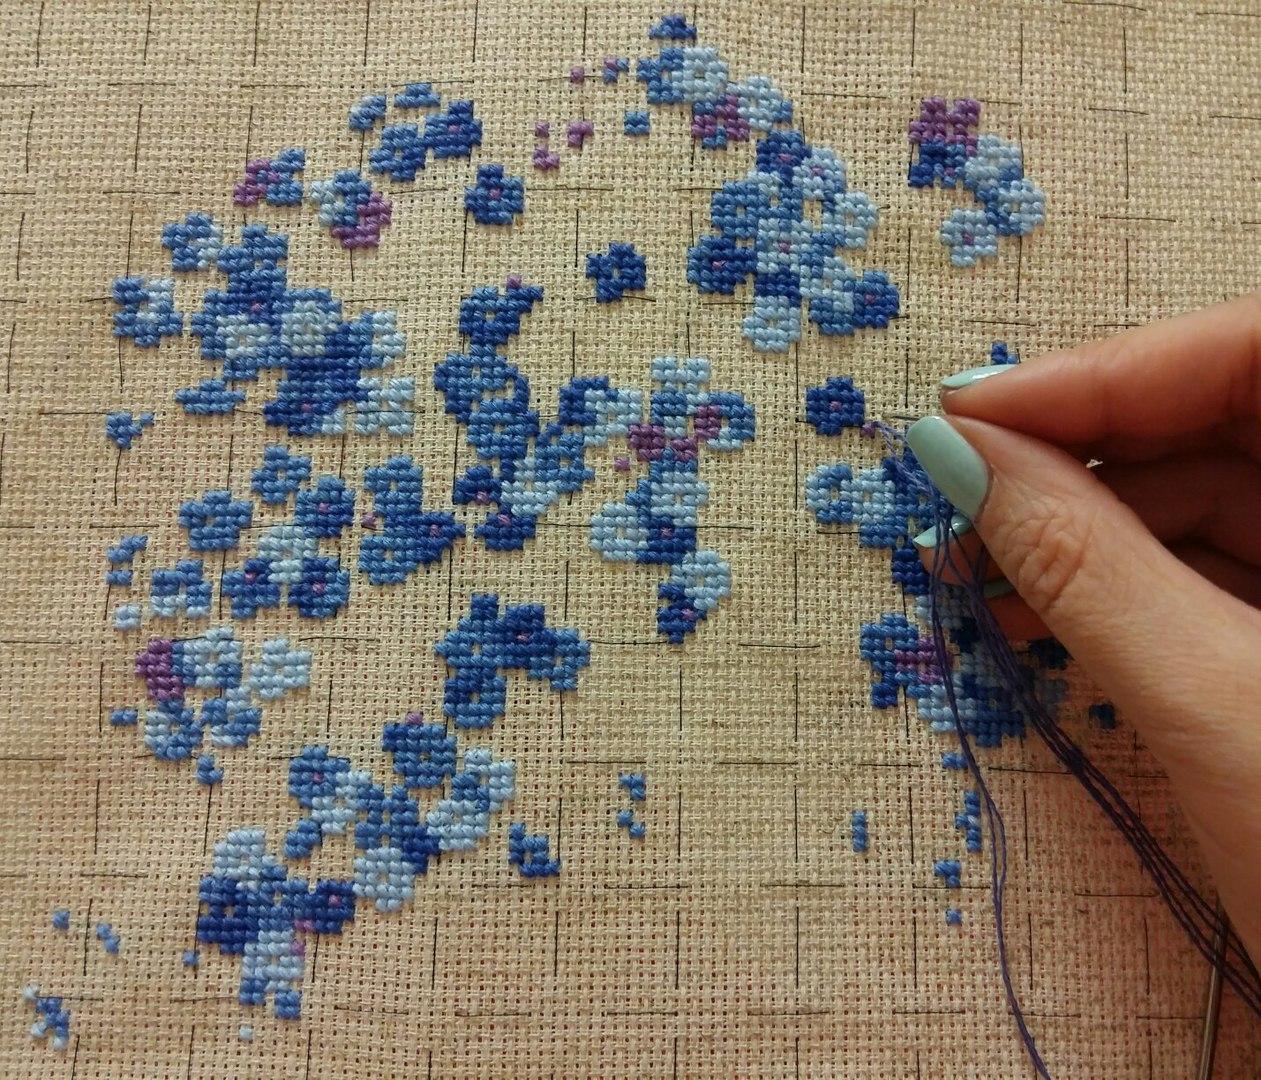 Вышивка незабудка риолис